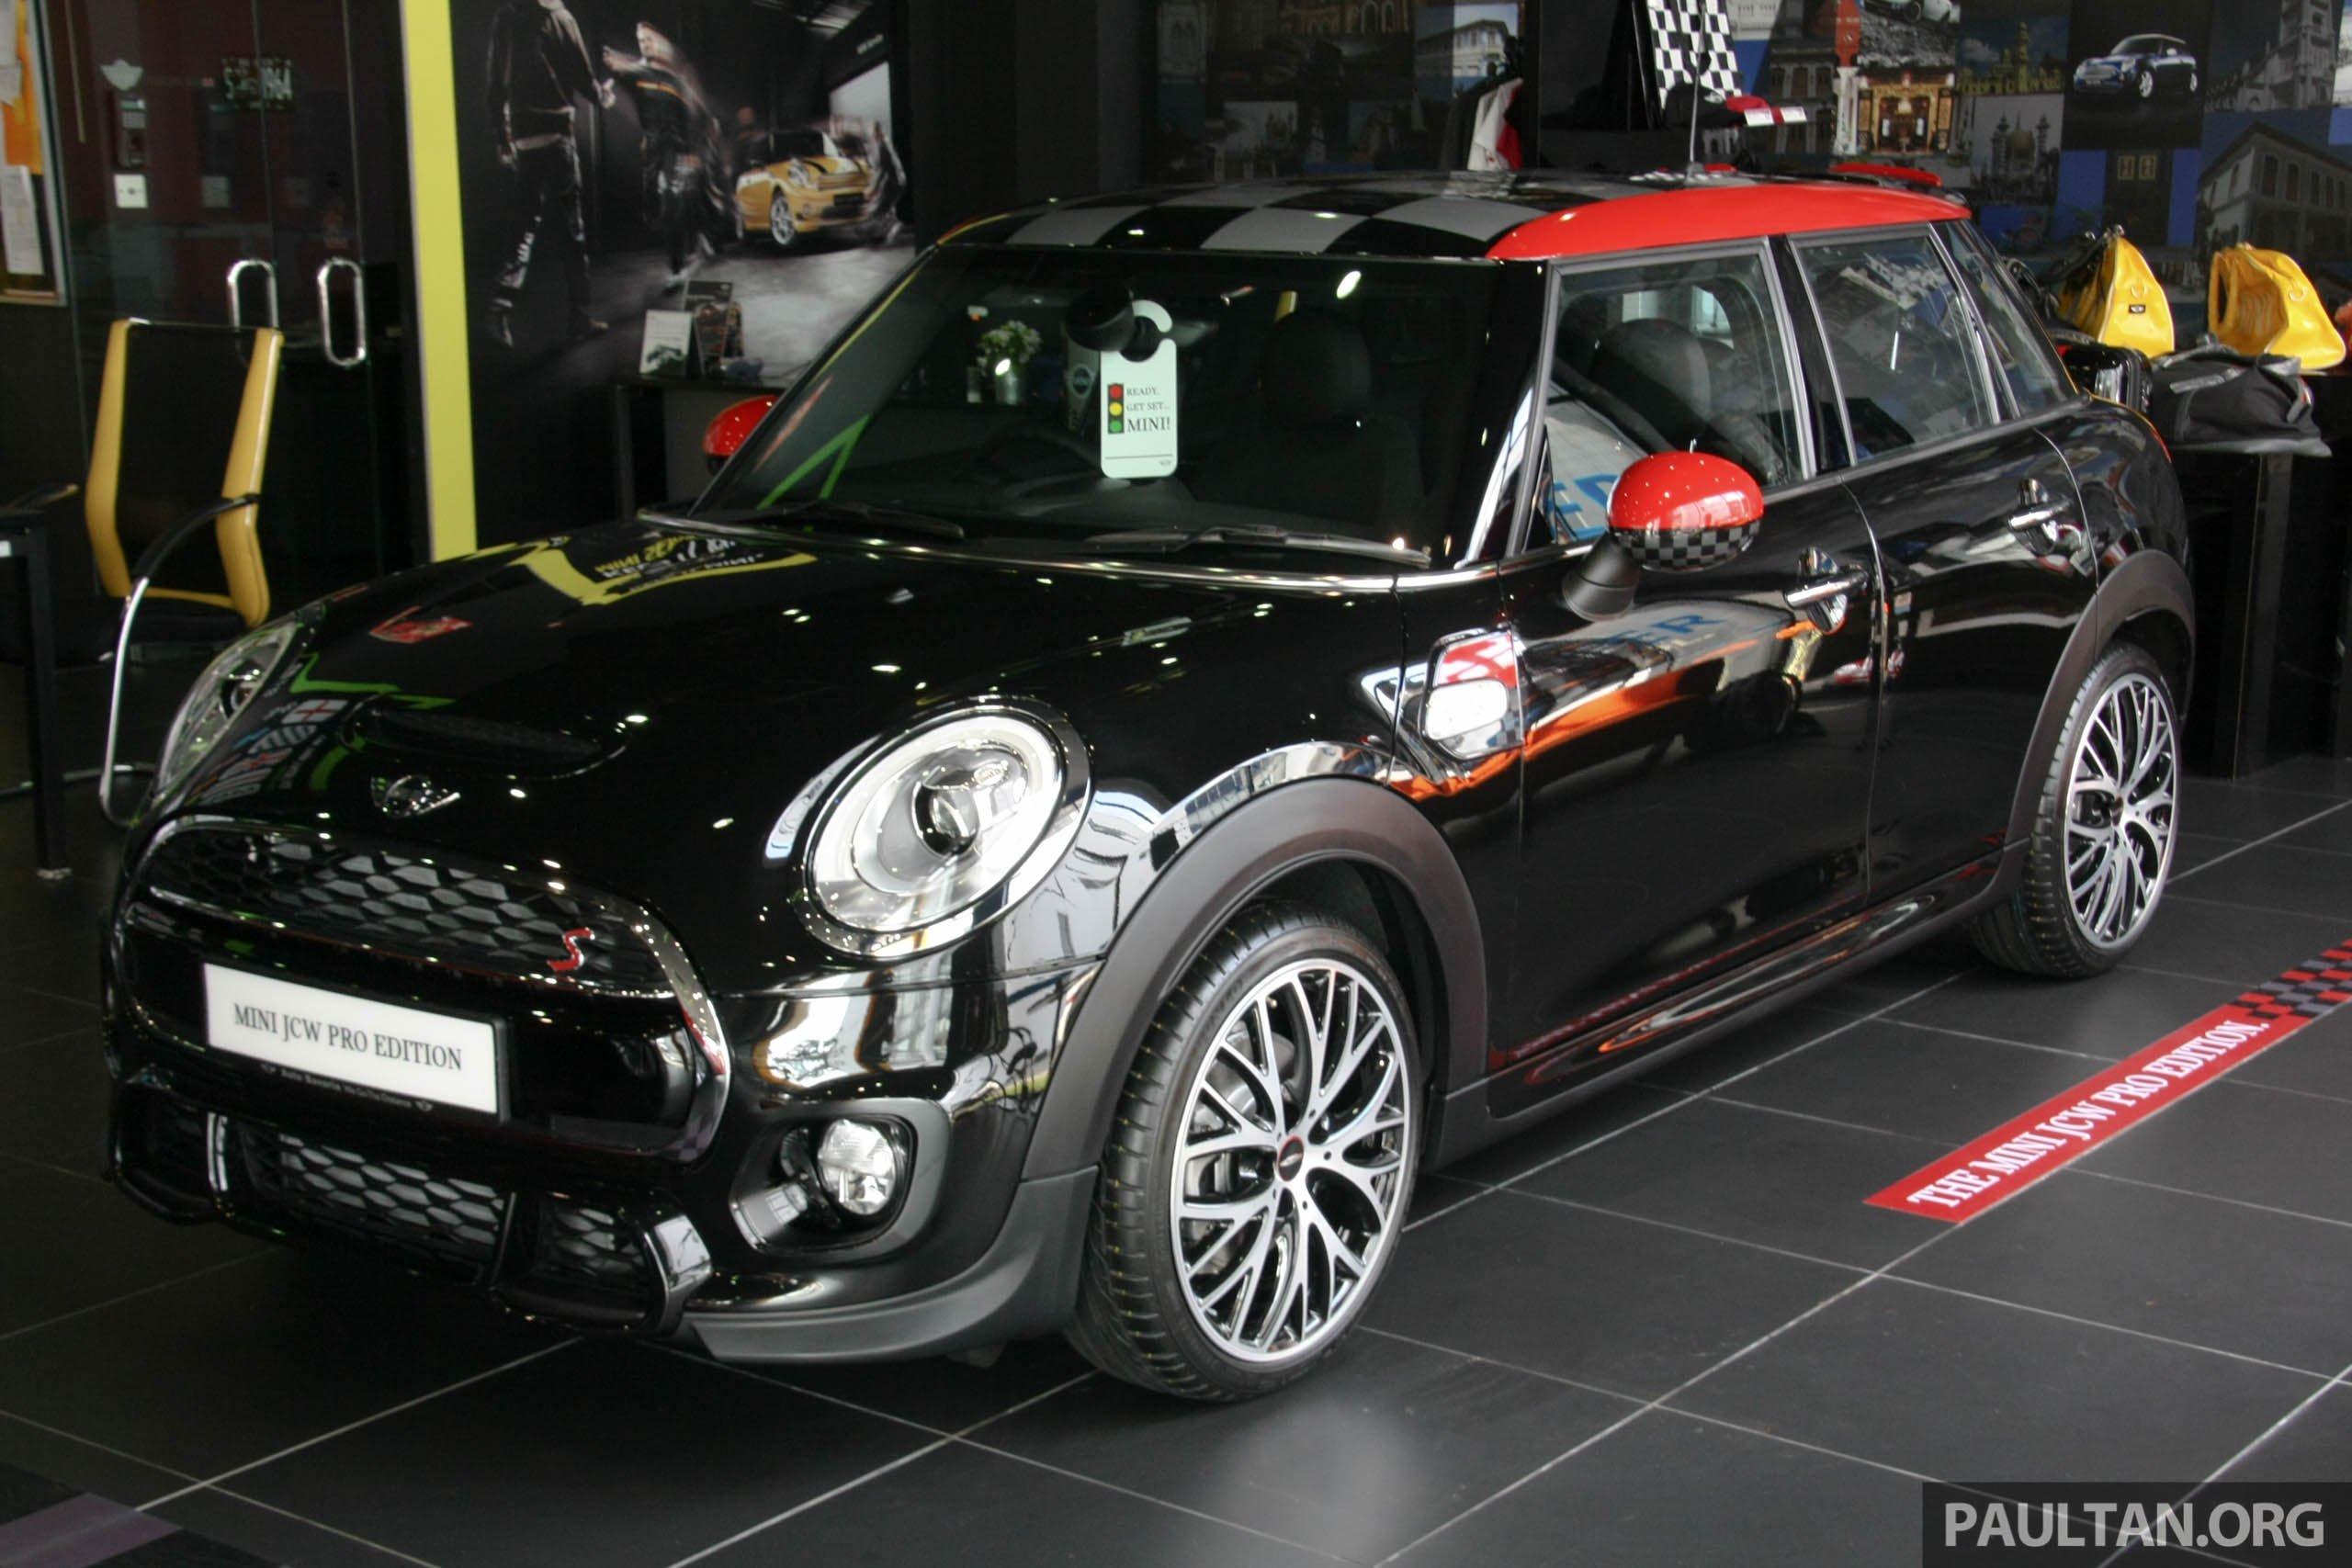 Gallery Mini Jcw Pro Edition At Auto Bavaria